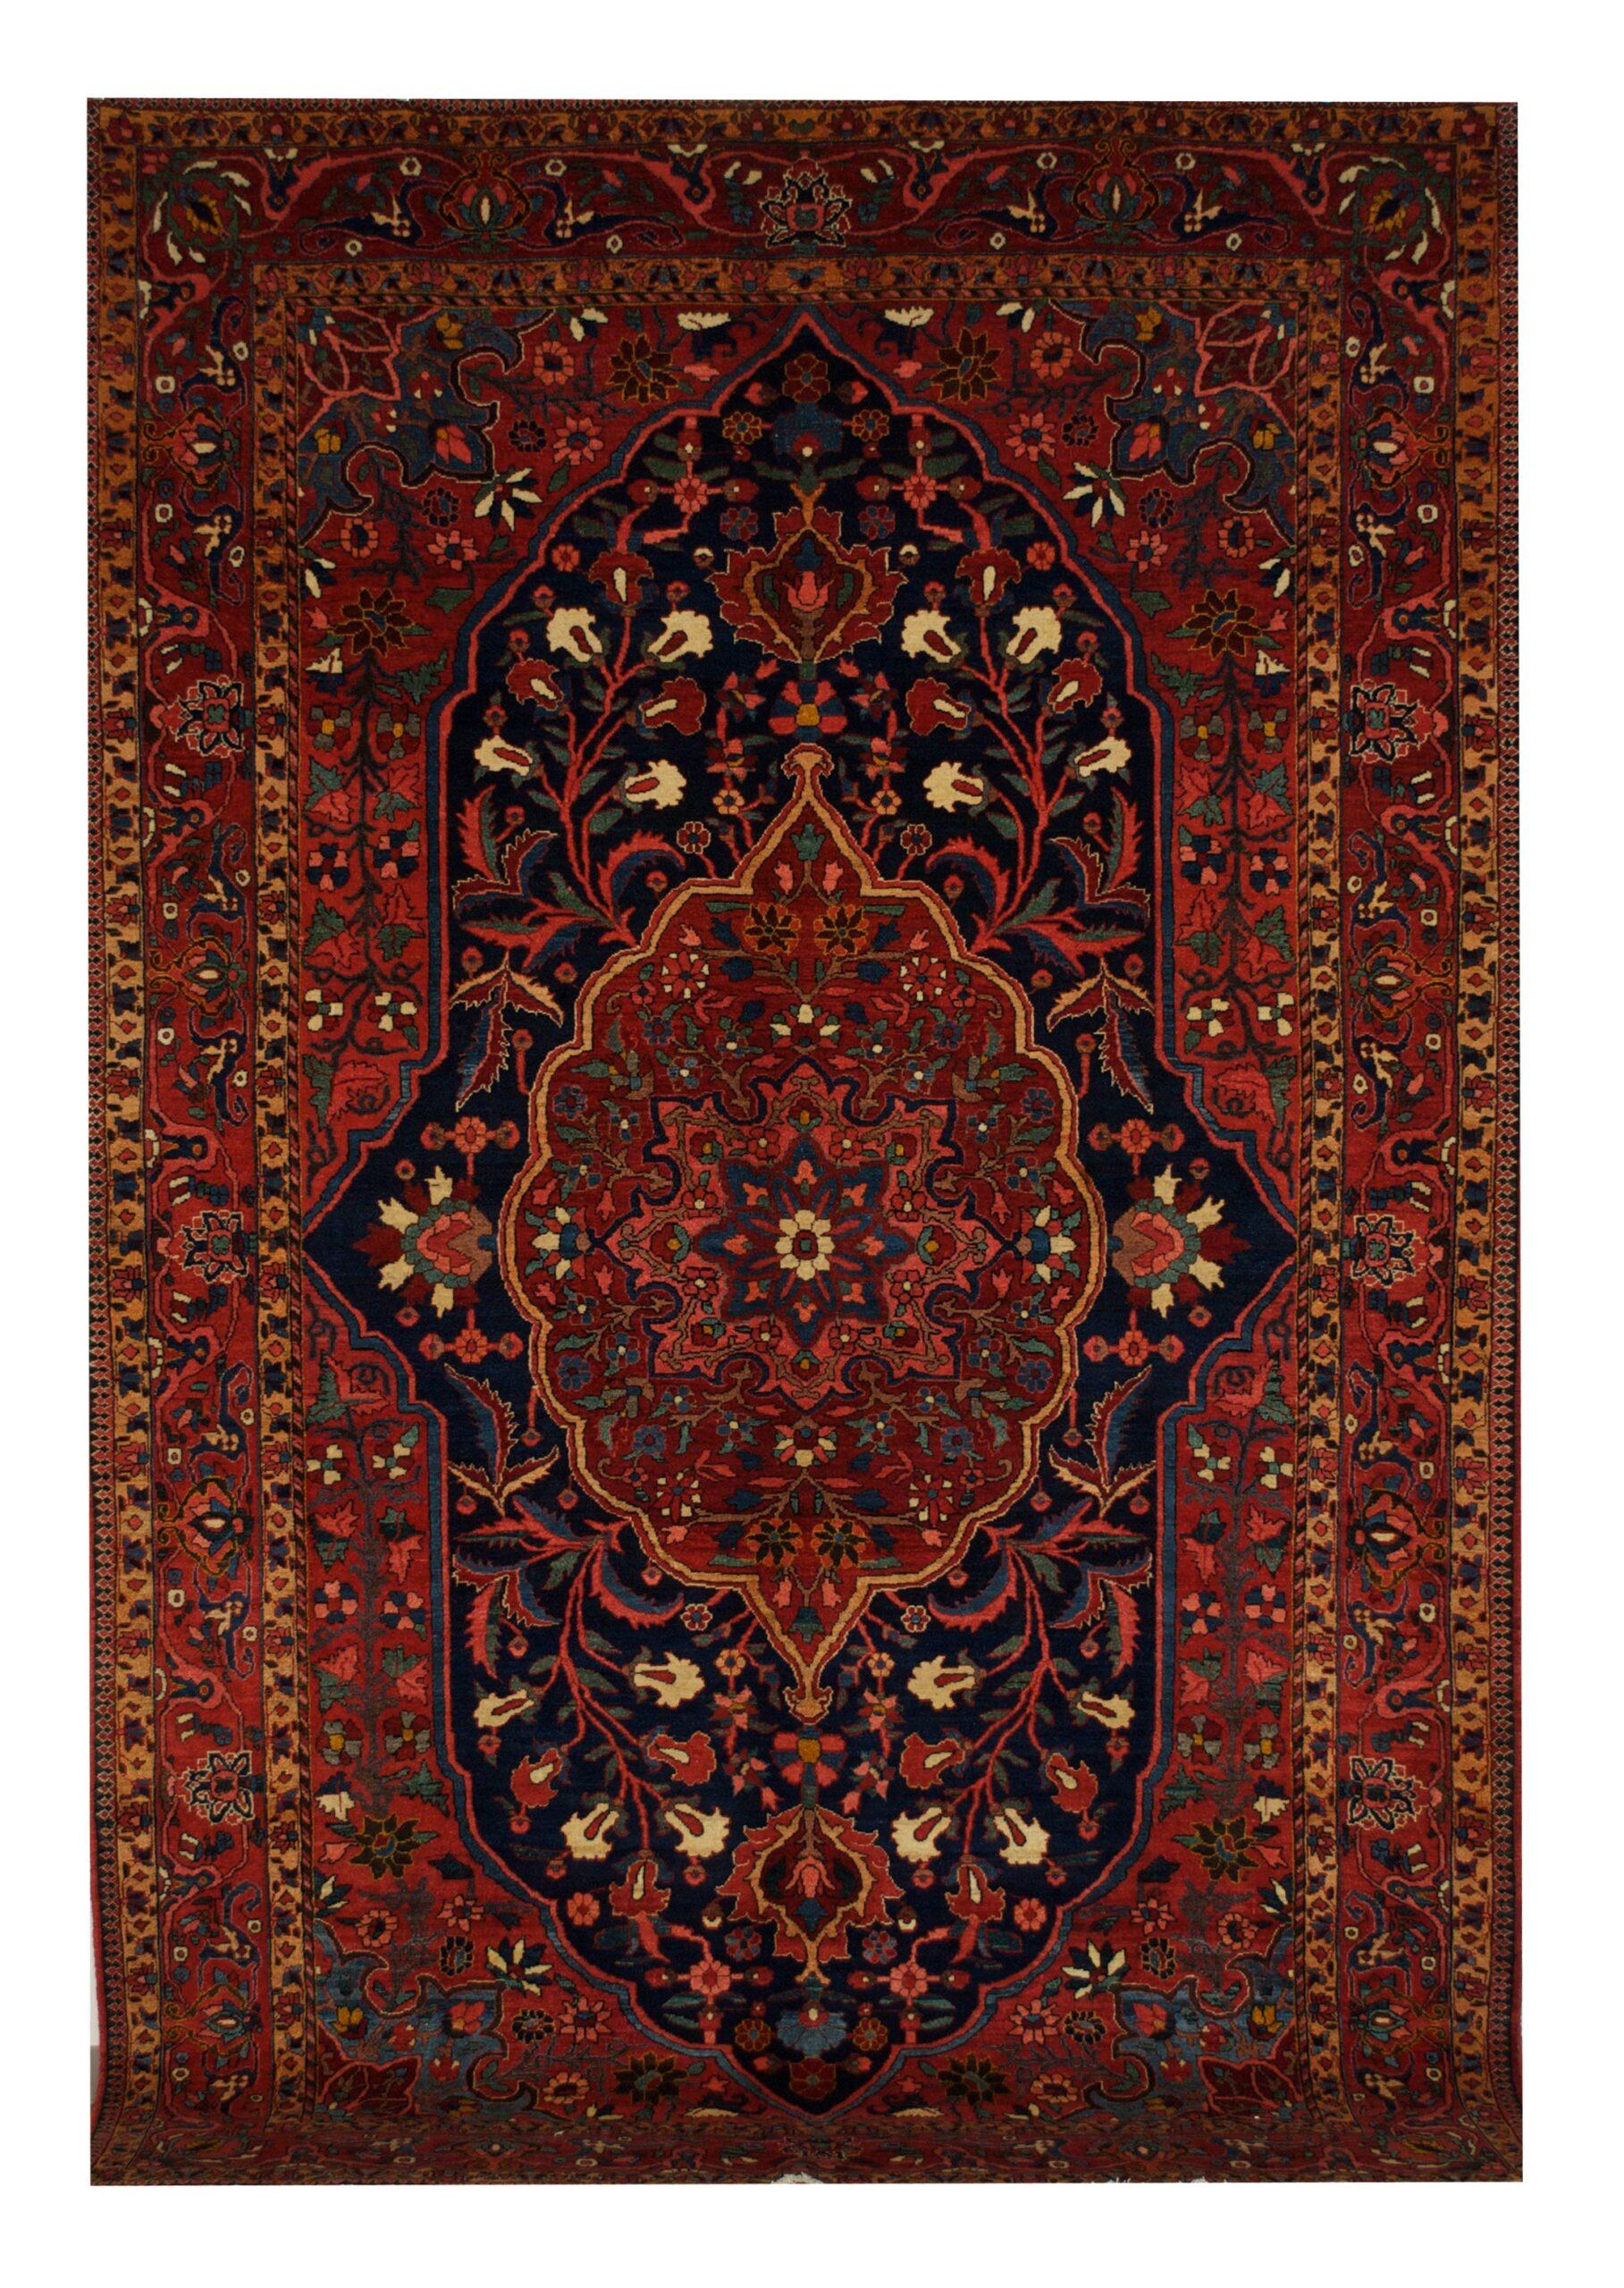 "Antique Persian Bakhtiari 7' 2"" x 10' 8"" Handmade Wool Area Rug - Shabahang Royal Carpet"